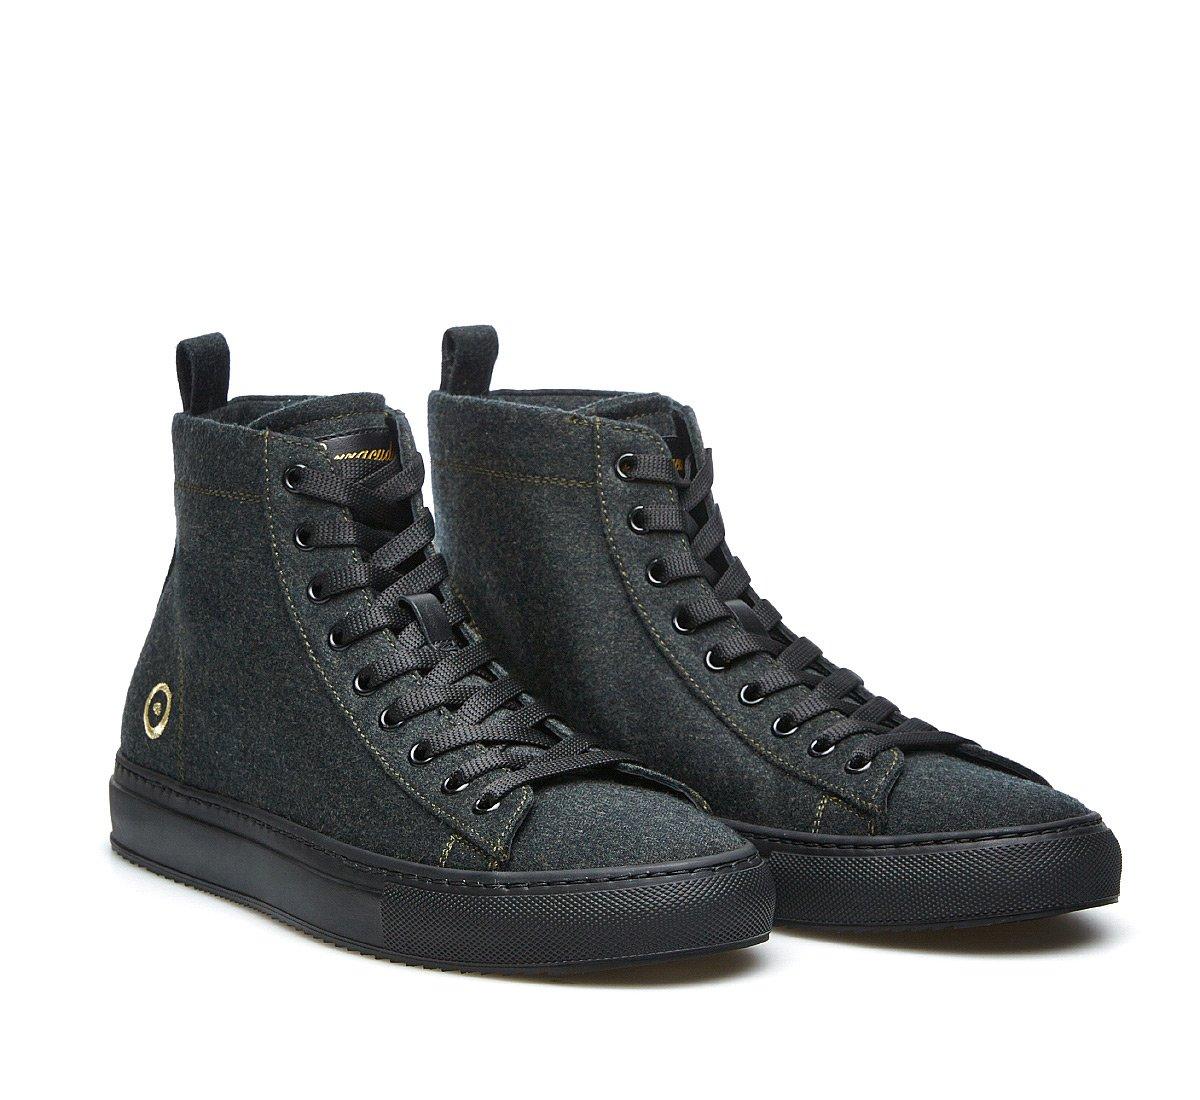 Barracuda Breathable/dry sneaker by Reda Active Merino Wool